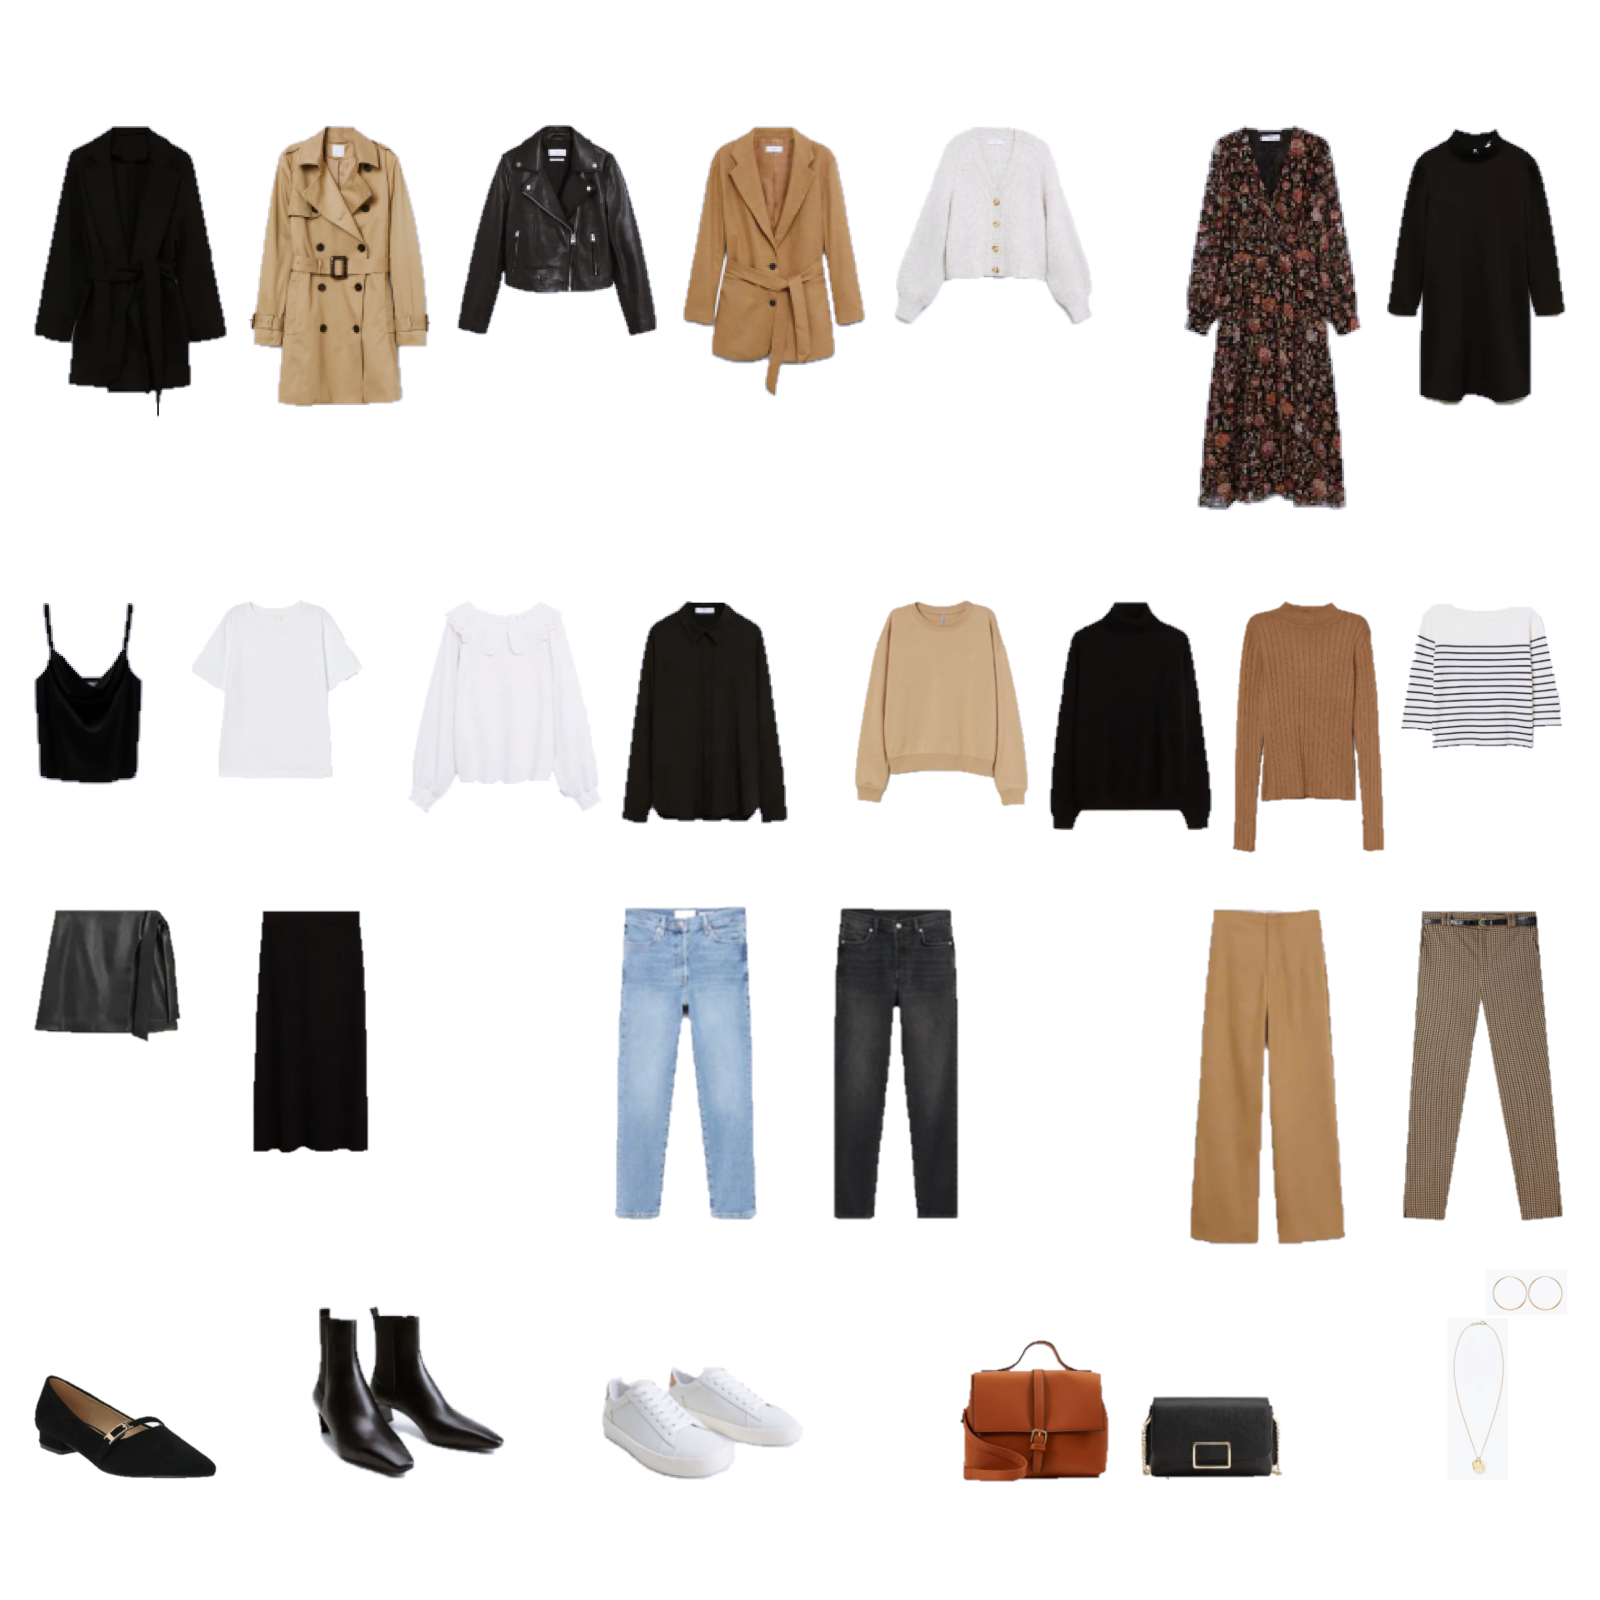 Autumn Capsule Wardrobe 2020